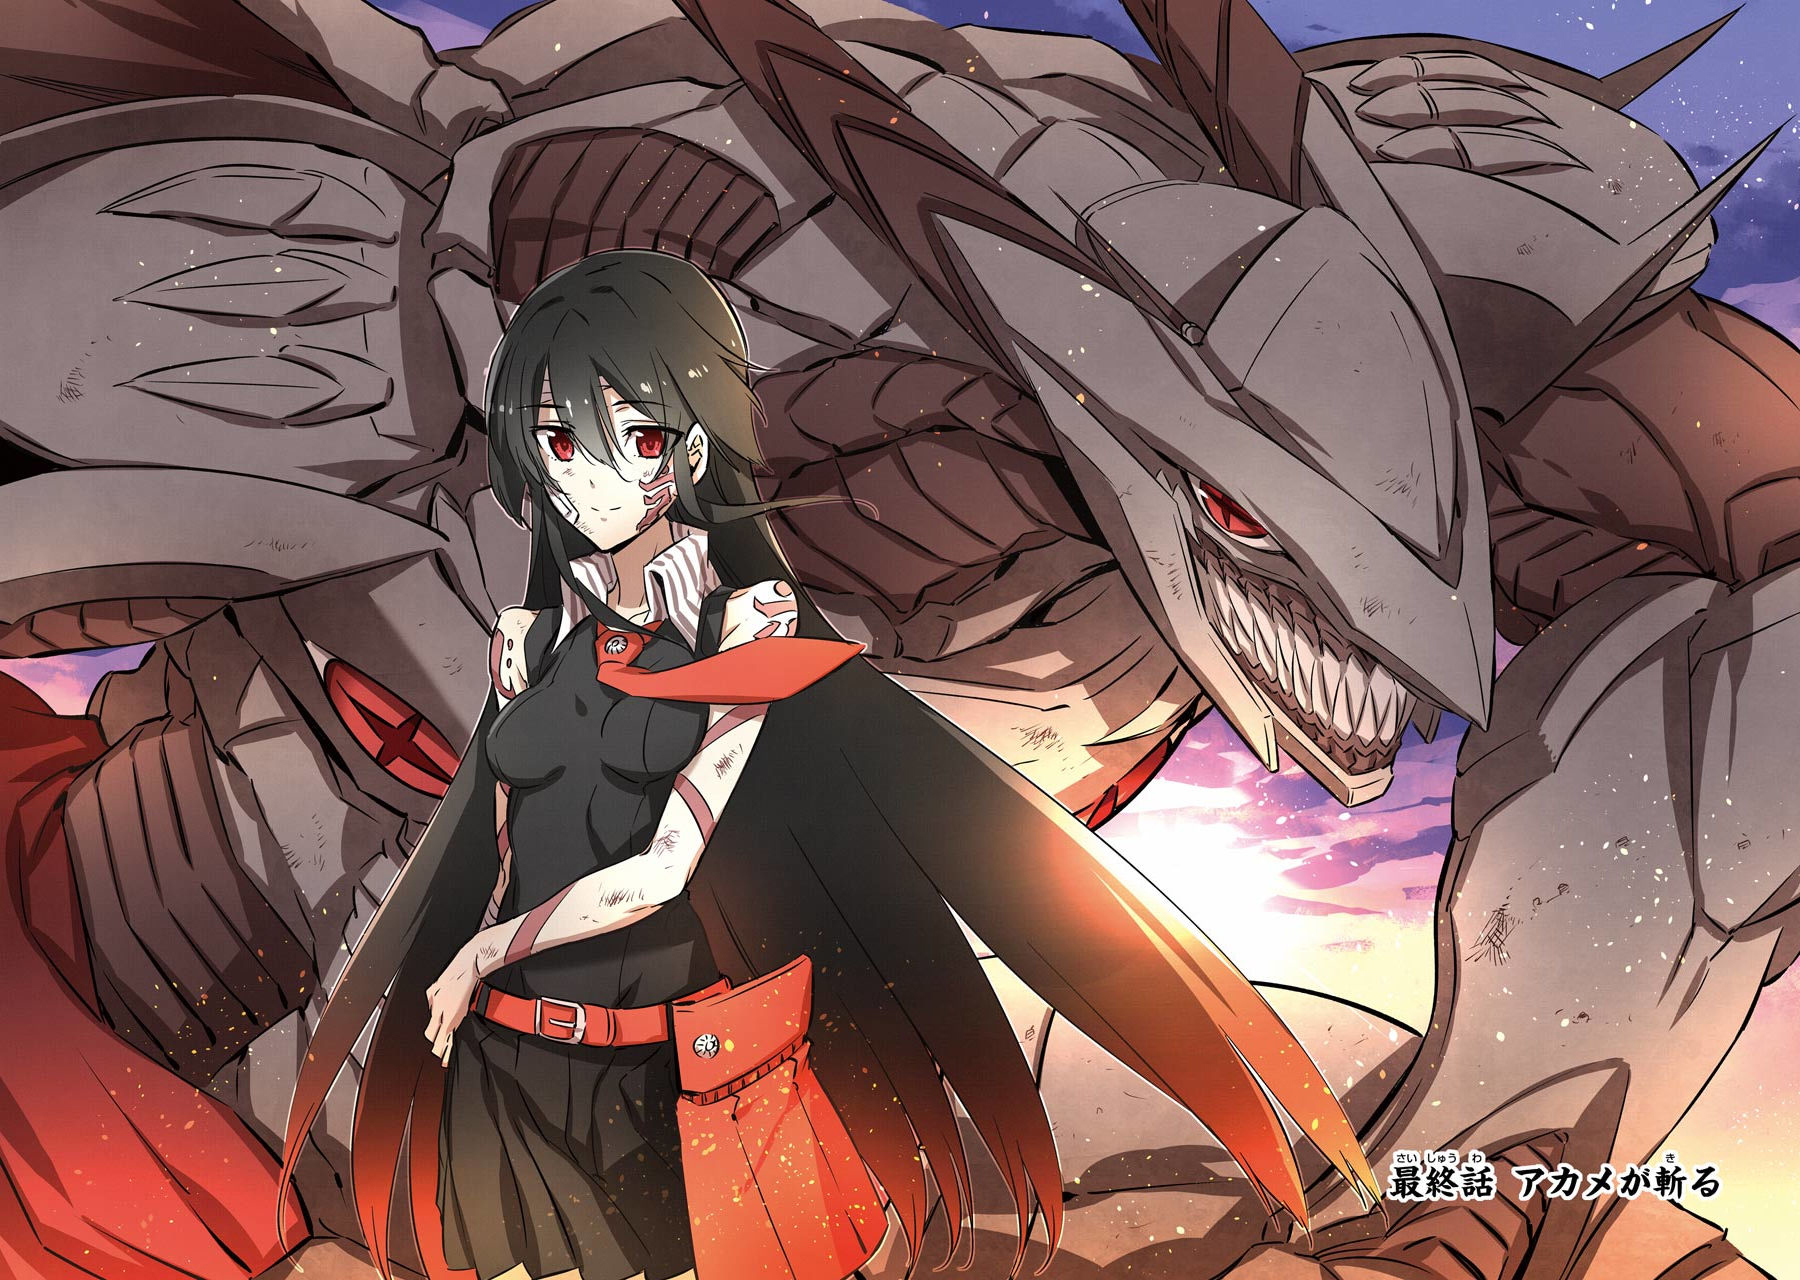 Tatsumi Akame Ga Kill Akame Ga Kill Zerochan Anime Image Board